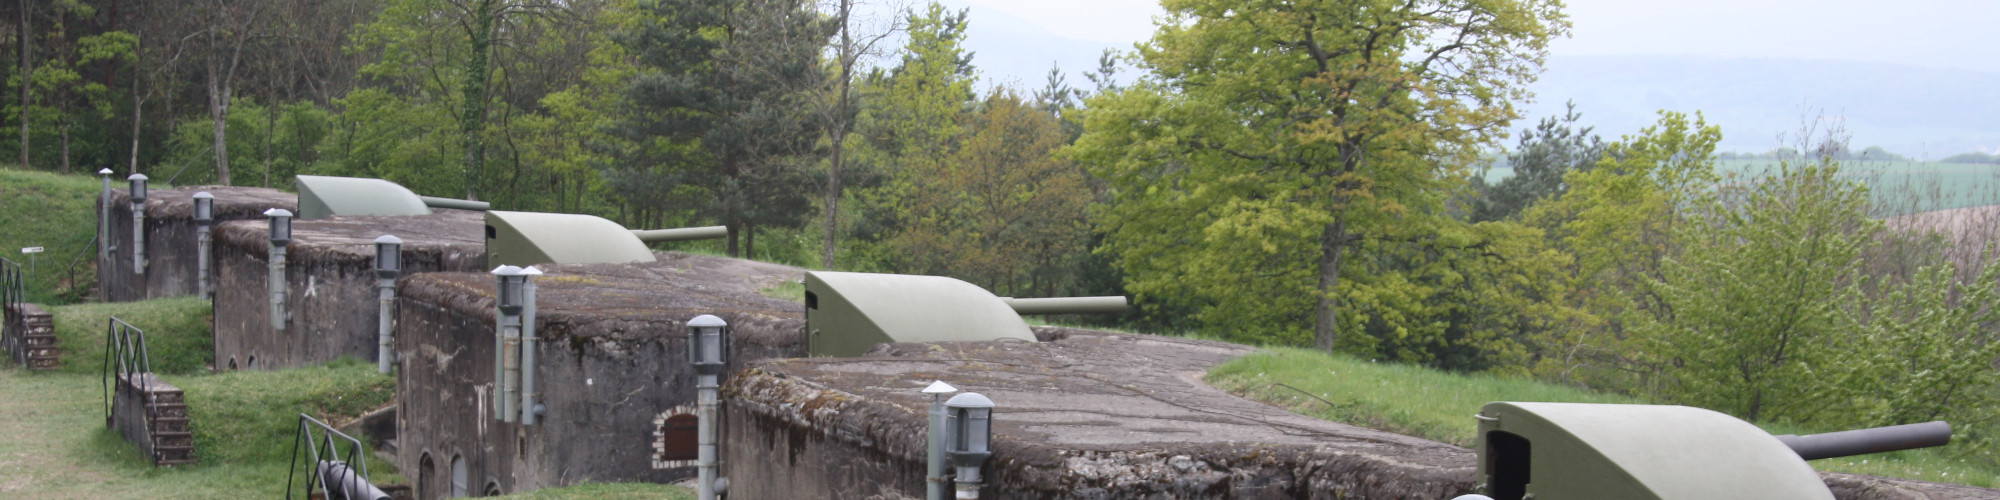 Kanonen Fort Mutzig